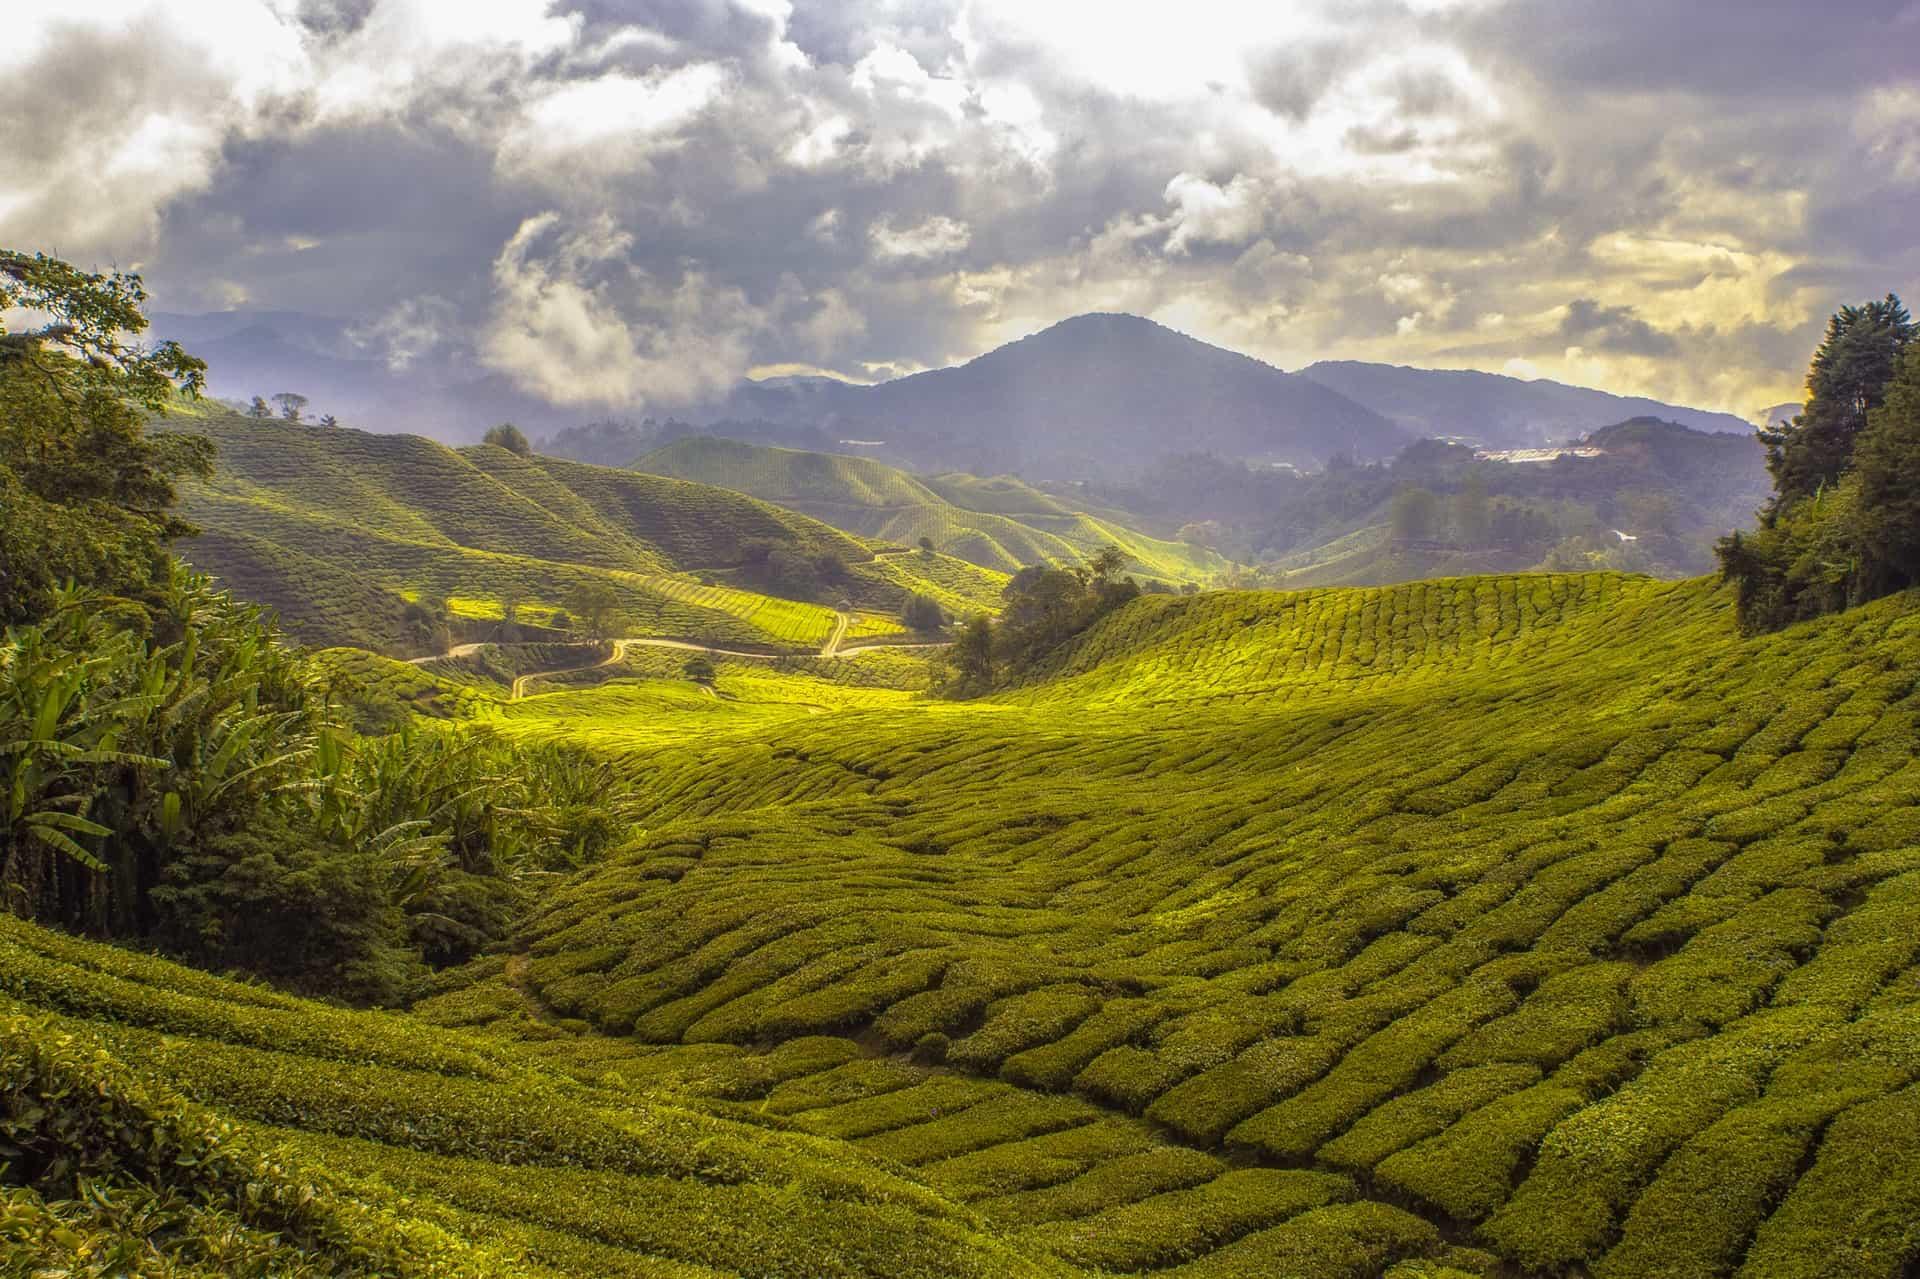 Visit the Tea plantation in Sri Lanka